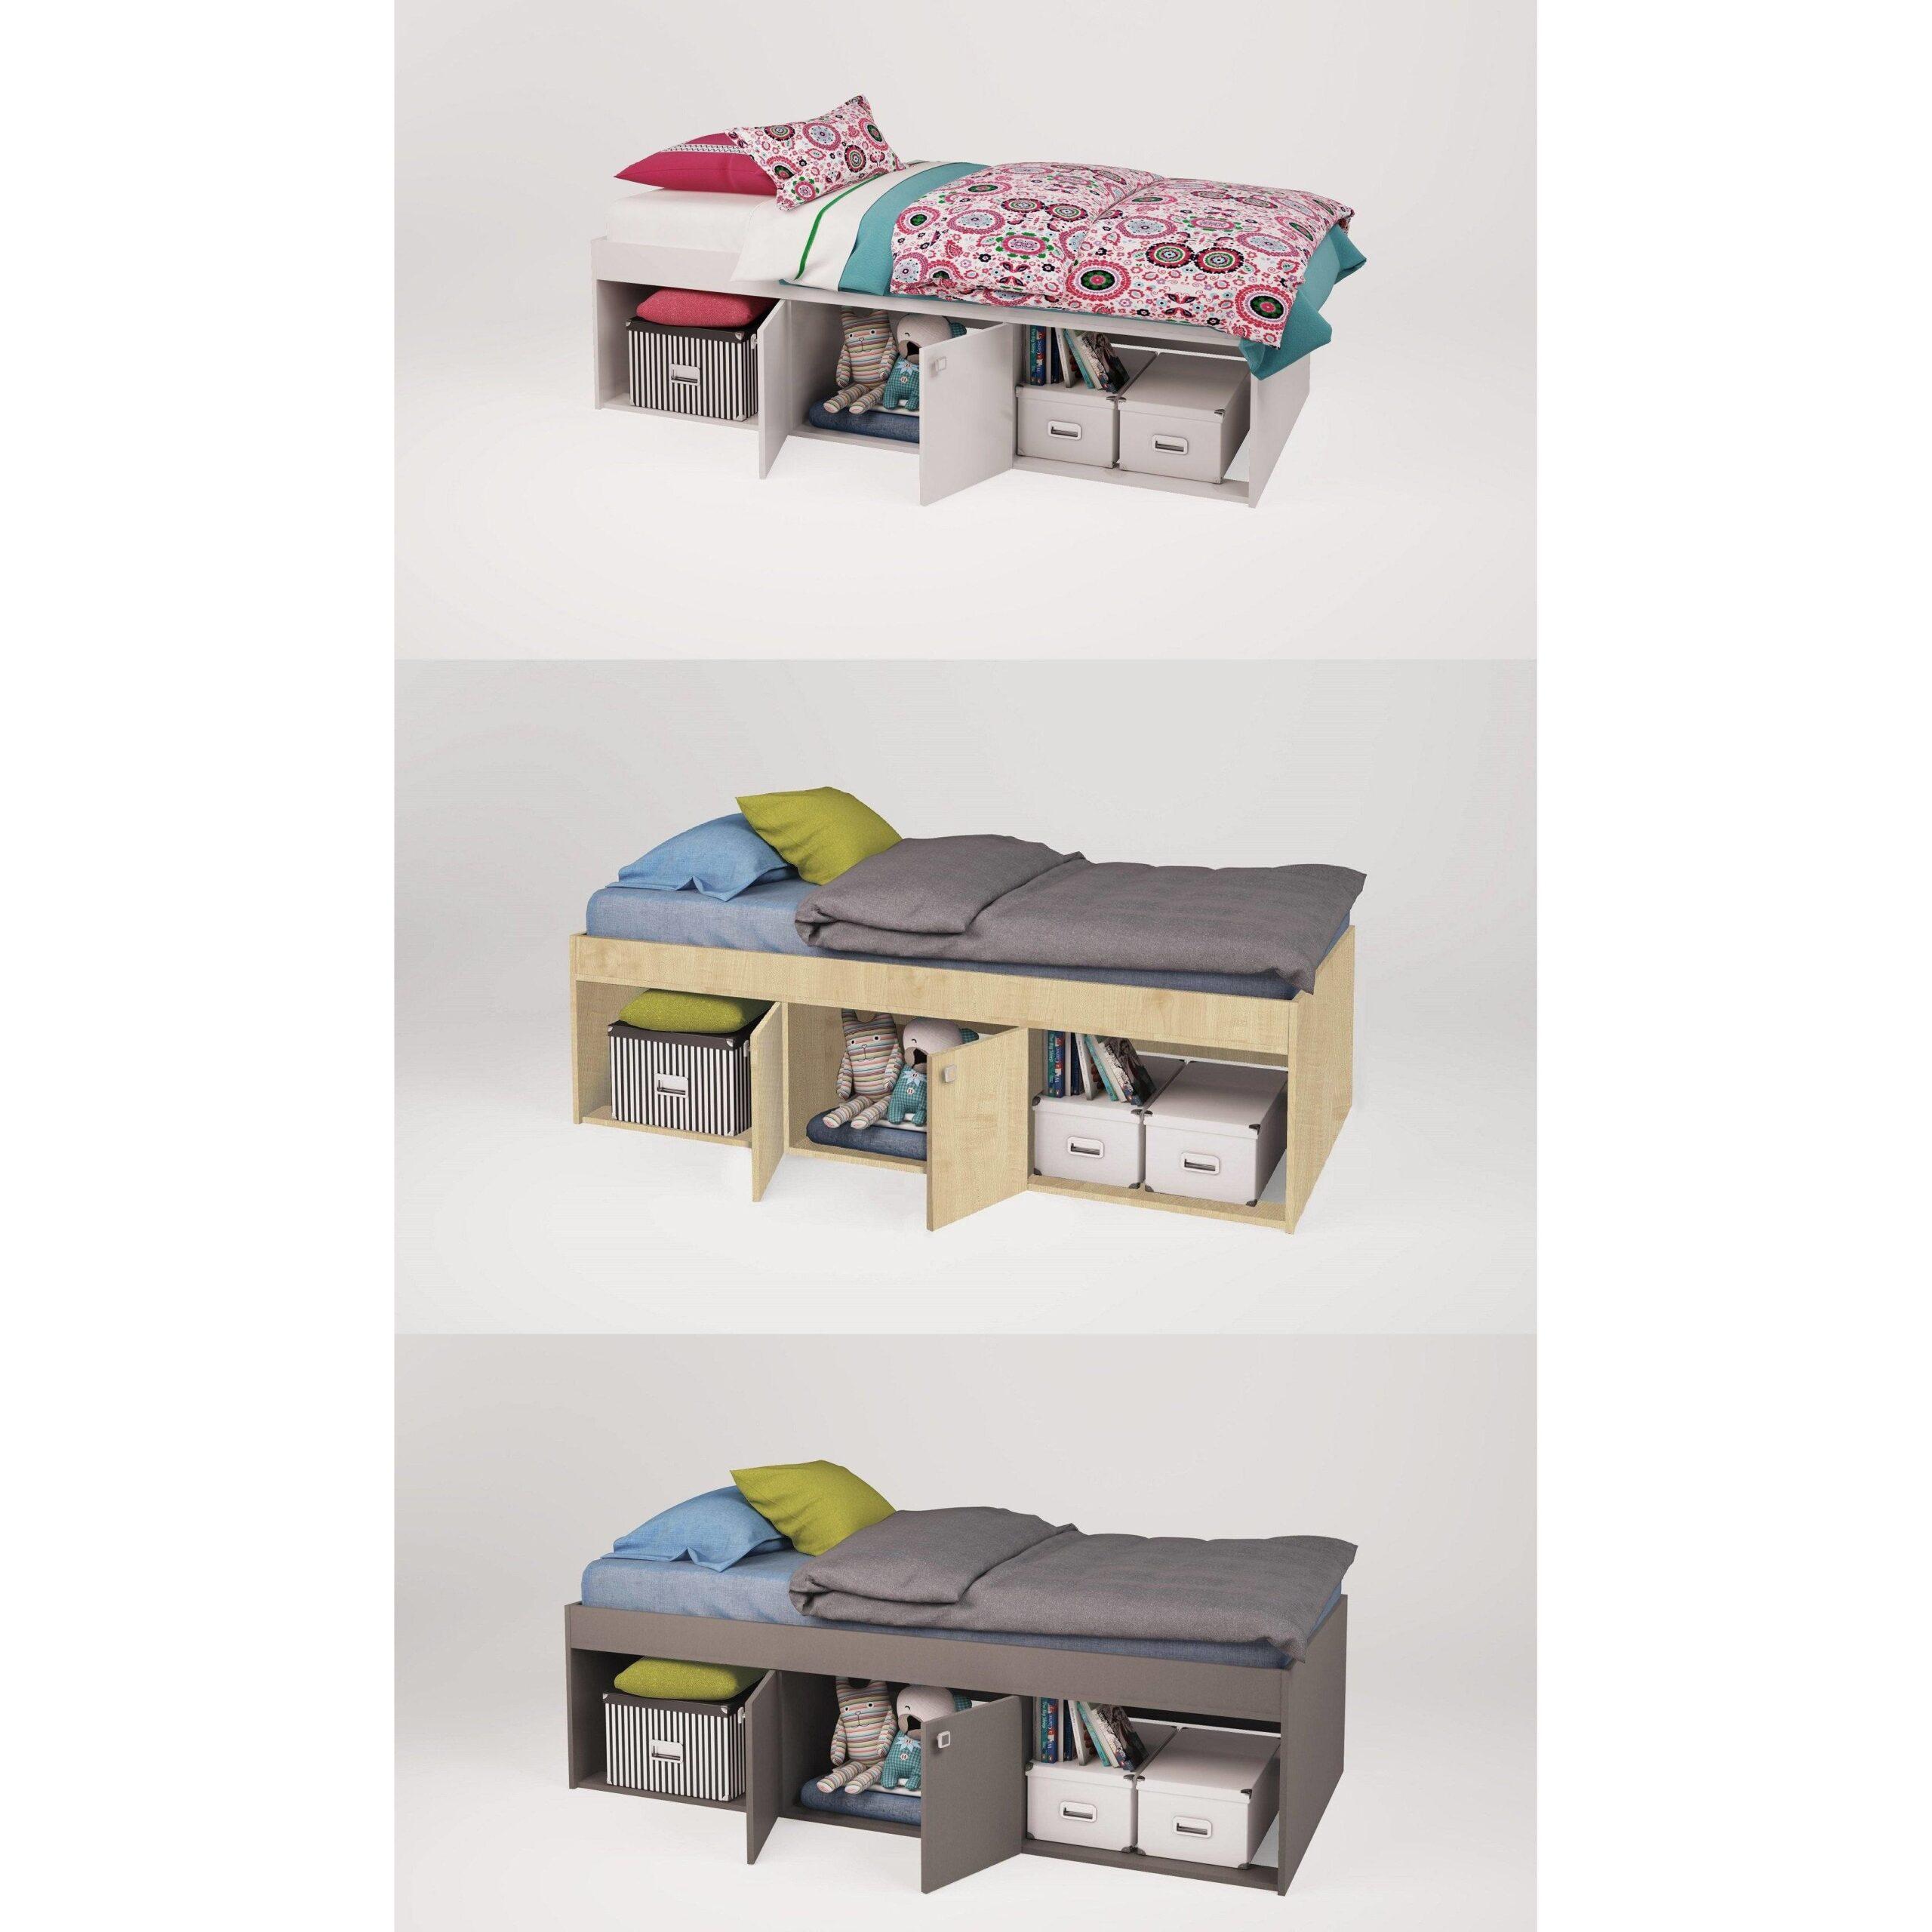 Full Size of Kinderbett Stauraum Polini Kids Jugendbett Simple Mit Farbauswahl Bett 160x200 Betten 140x200 200x200 Wohnzimmer Kinderbett Stauraum